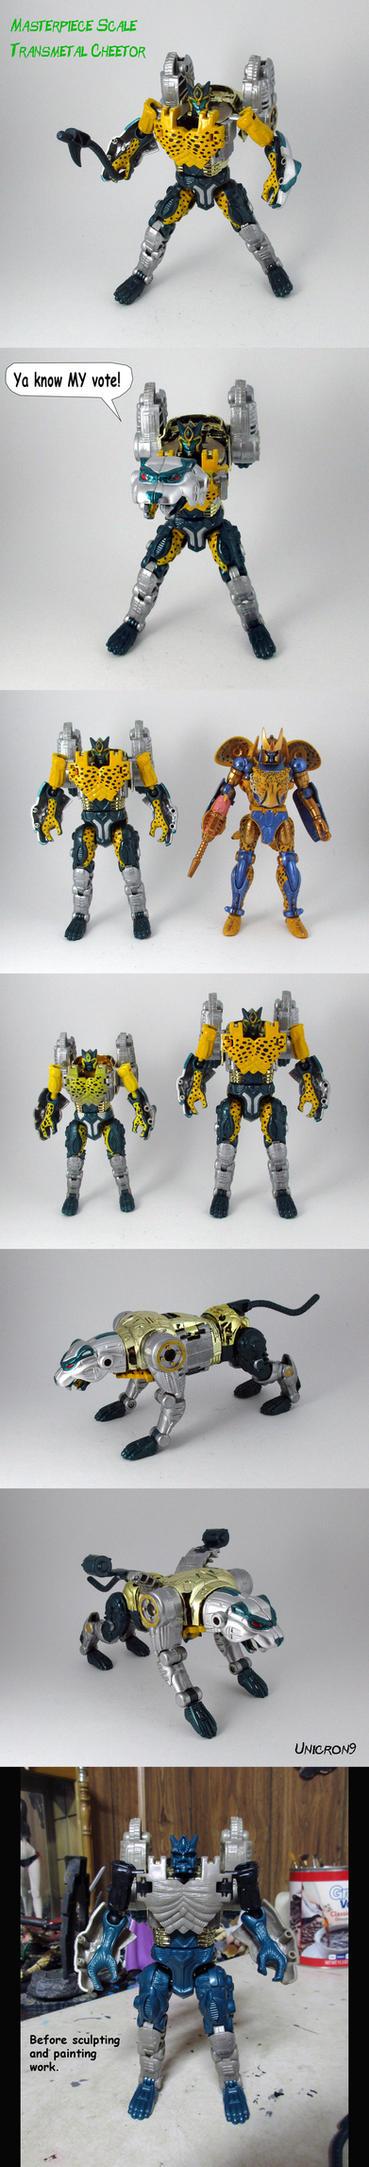 Masterpiece Scale Transmetal Cheetor by Unicron9